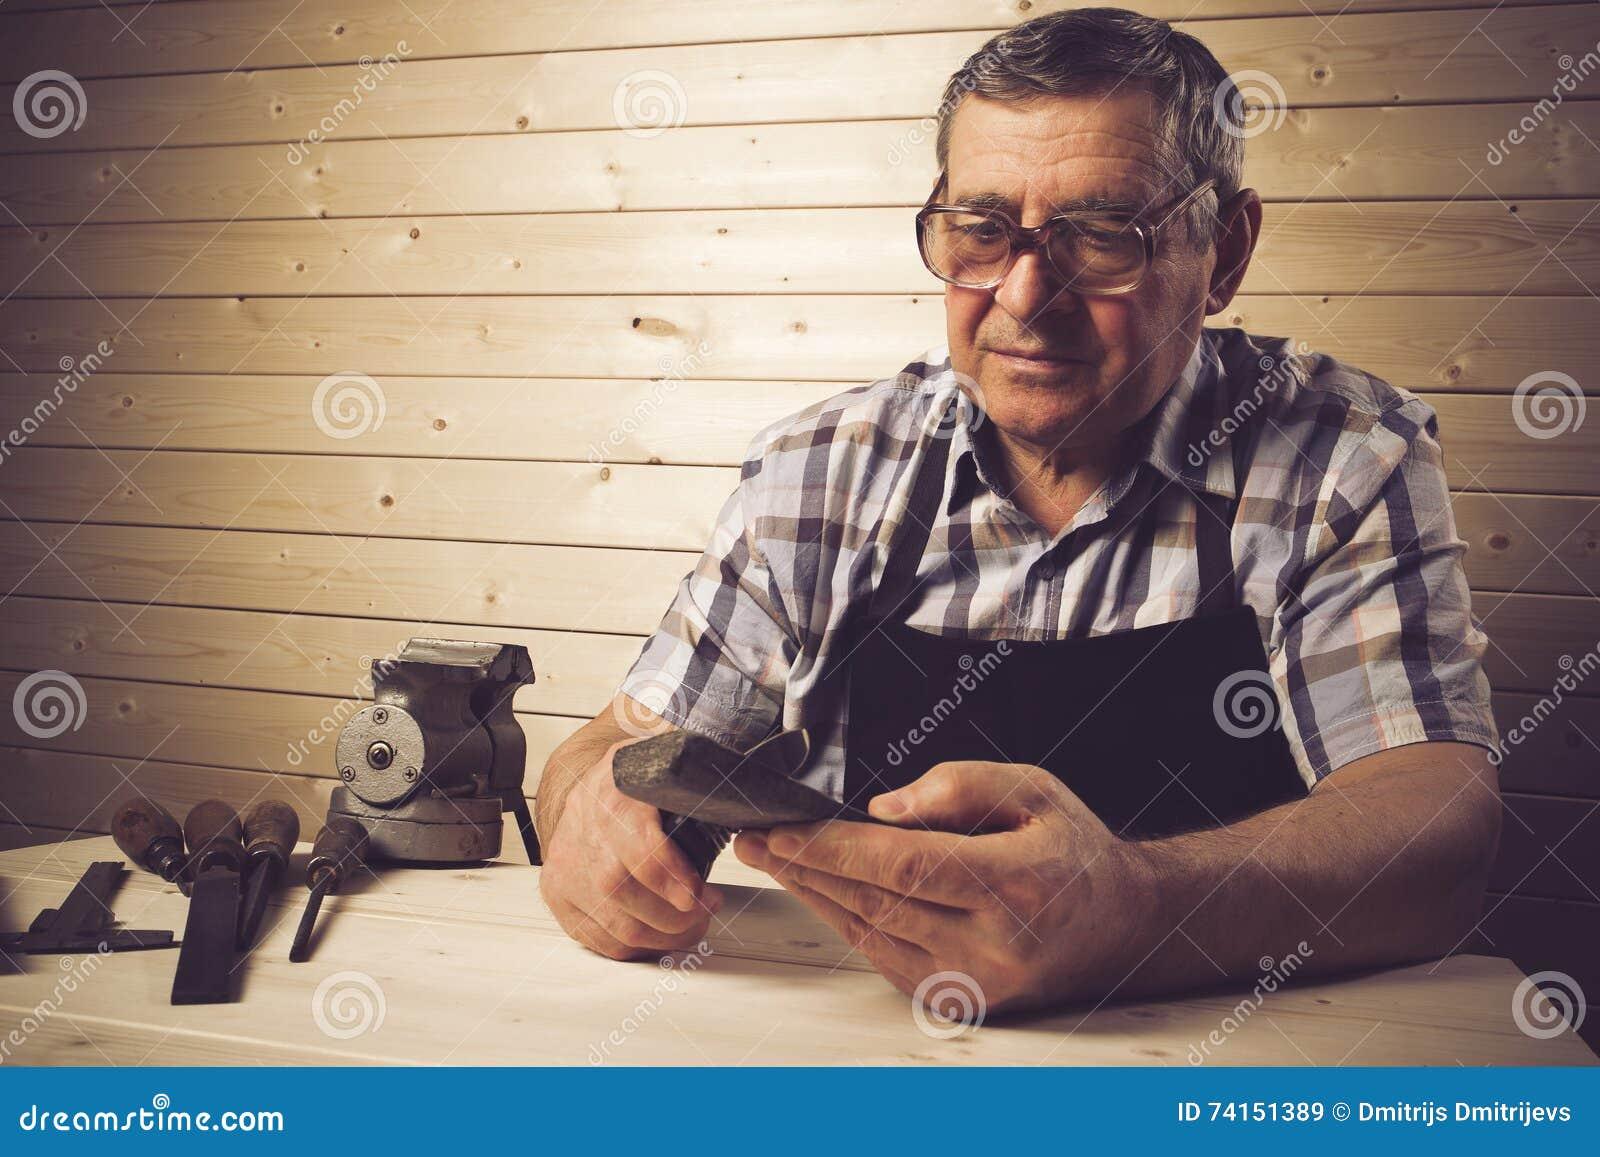 Senior carpenter working in his workshop